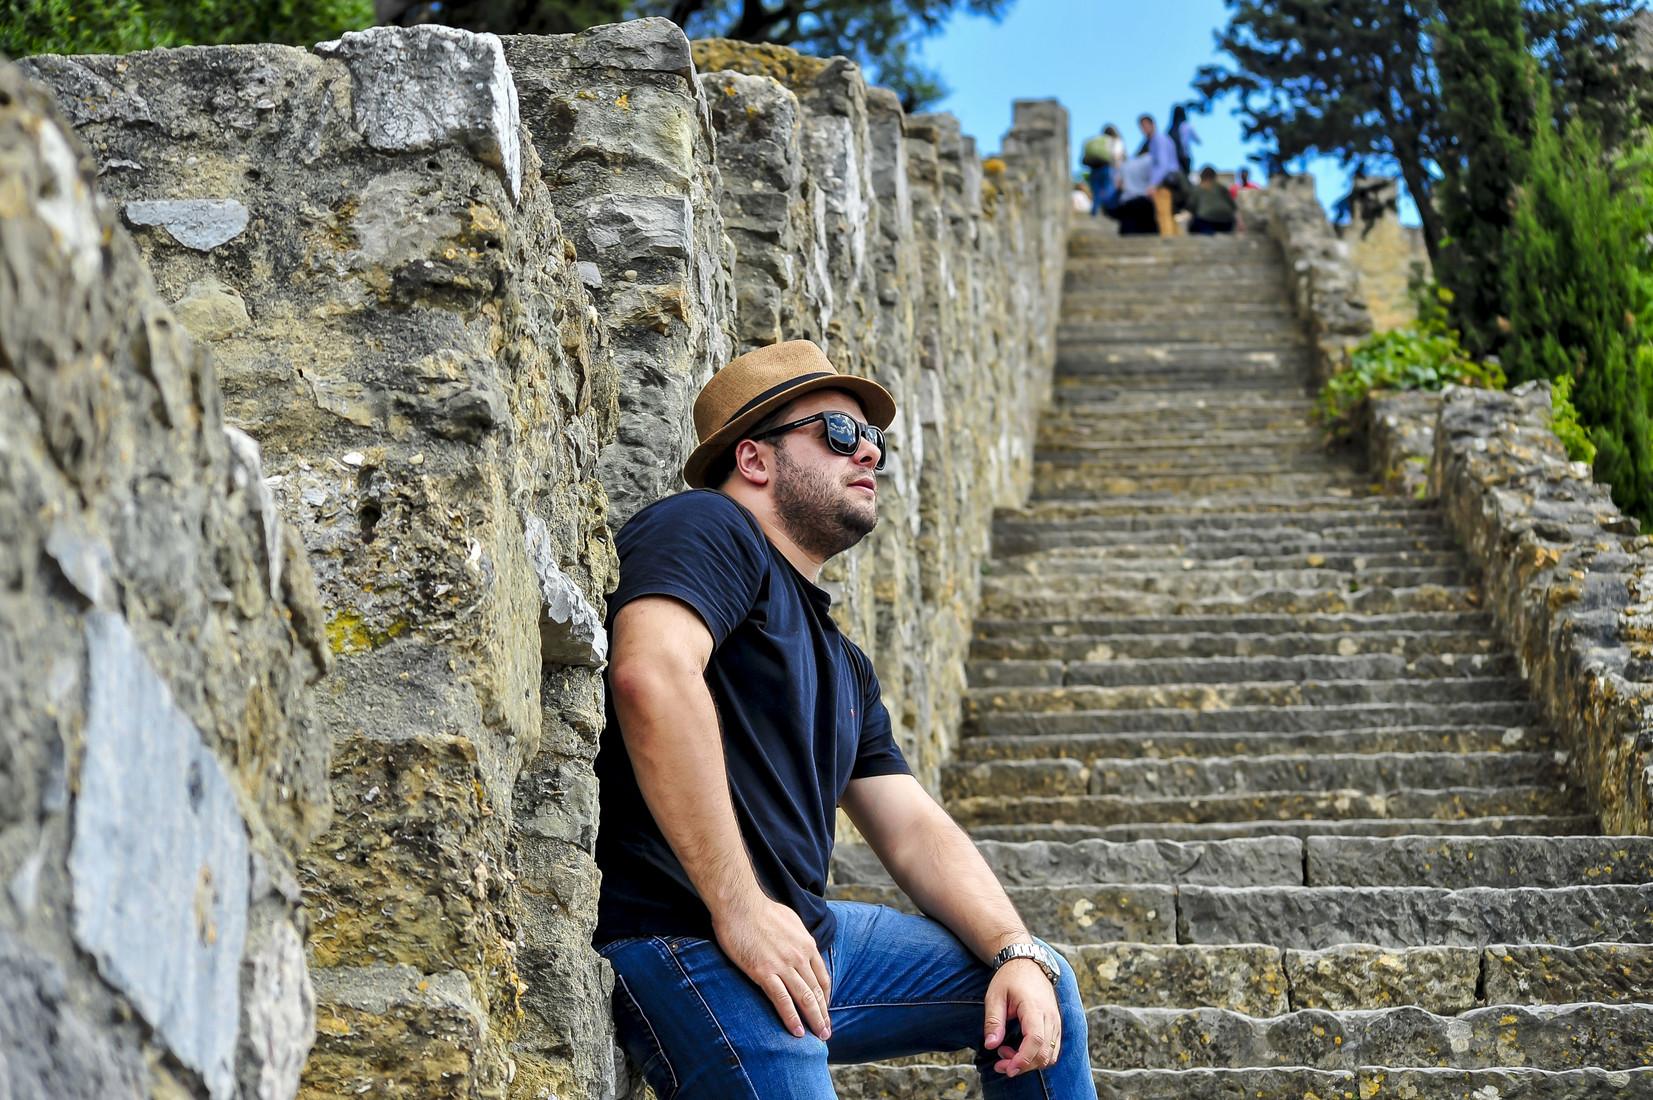 Contate Fotografia de casamento Curitiba - Viagens - Maycon Moura